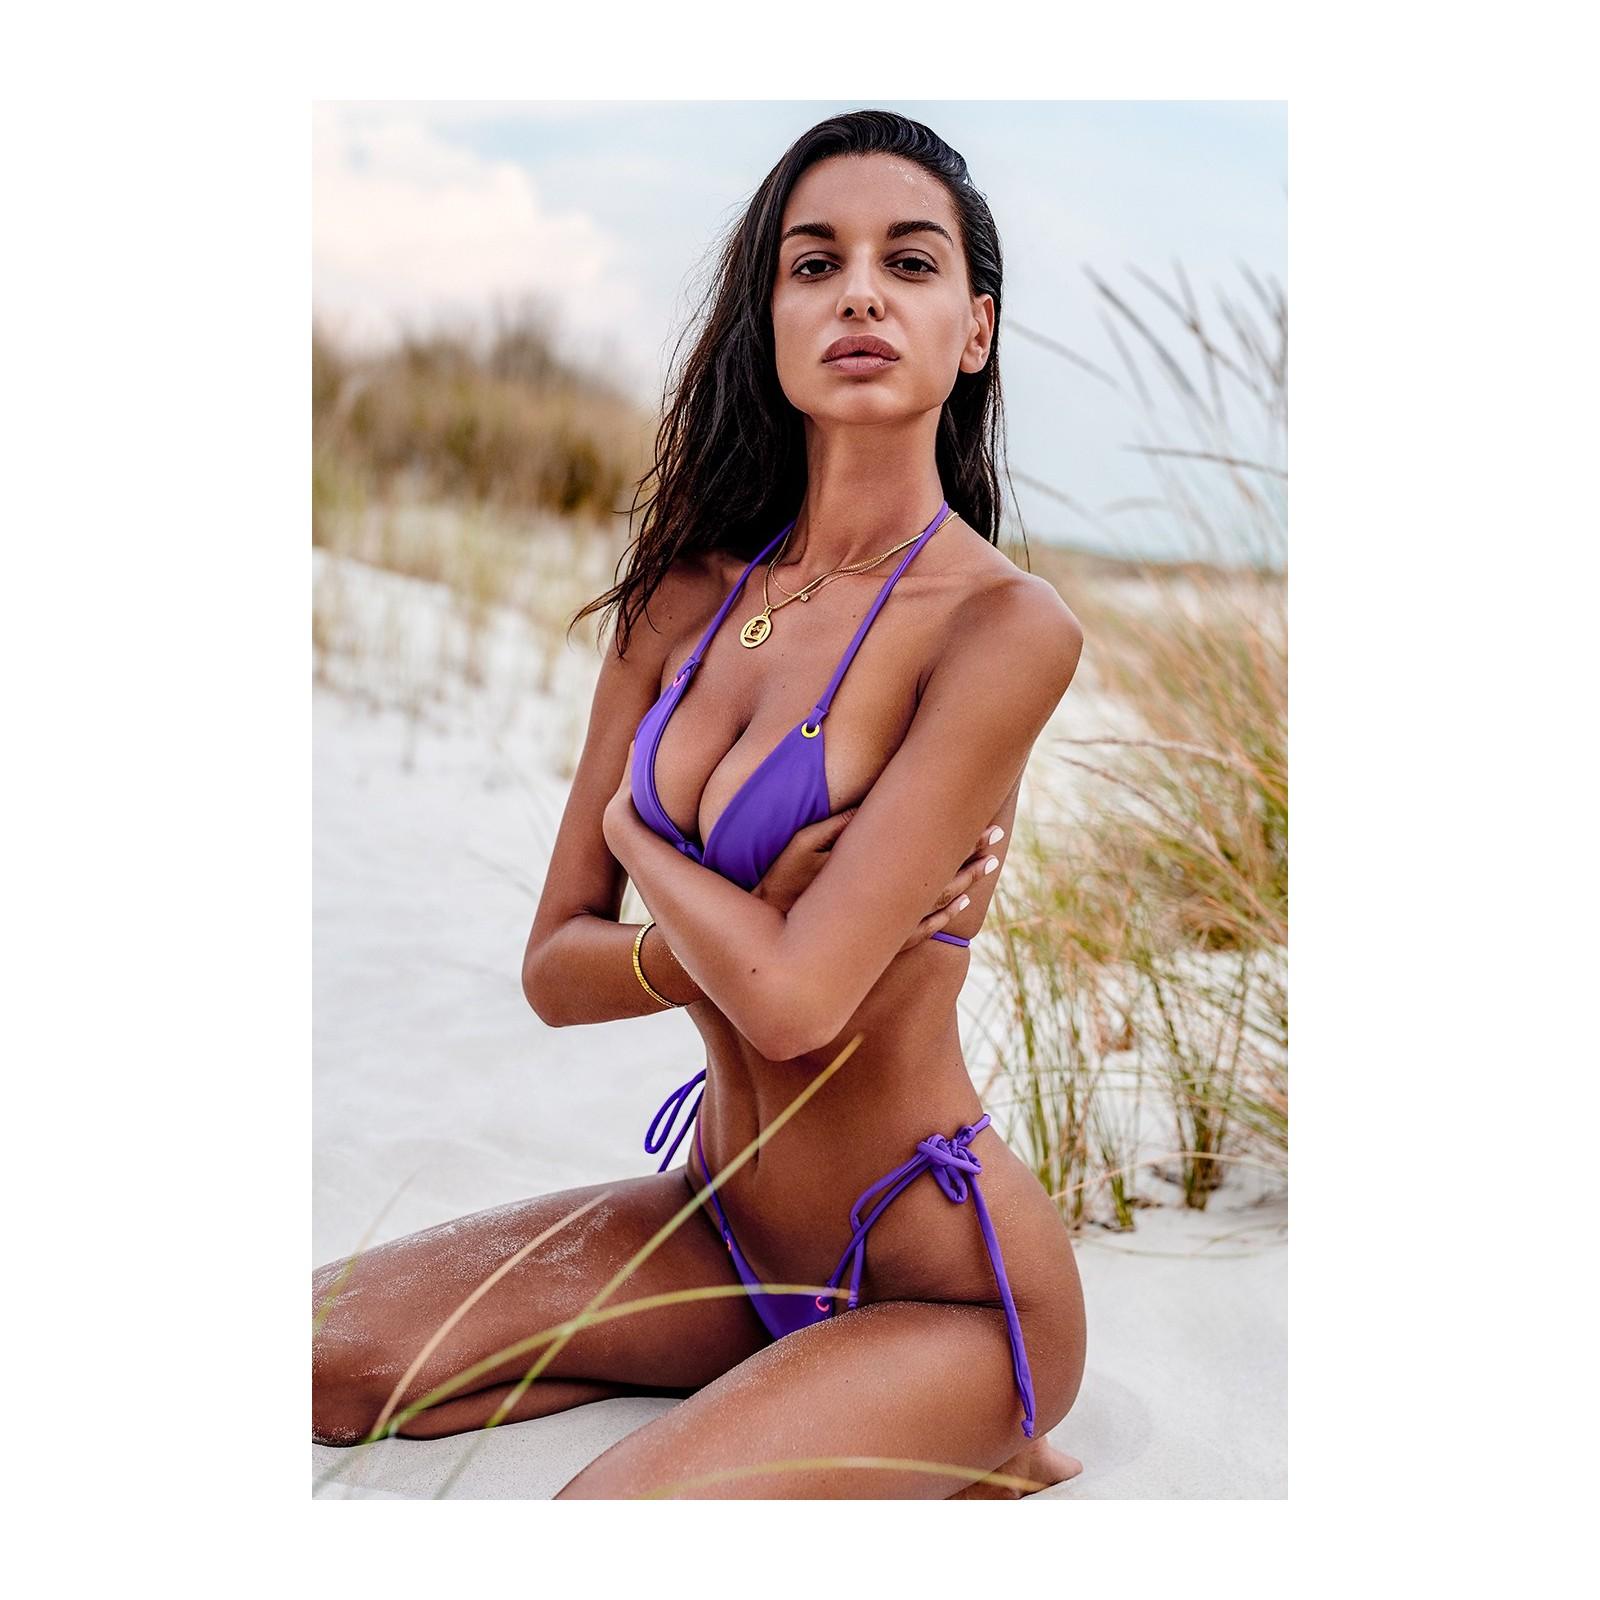 Micro-Bikini Beverelle violett - 8 - Vorschaubild